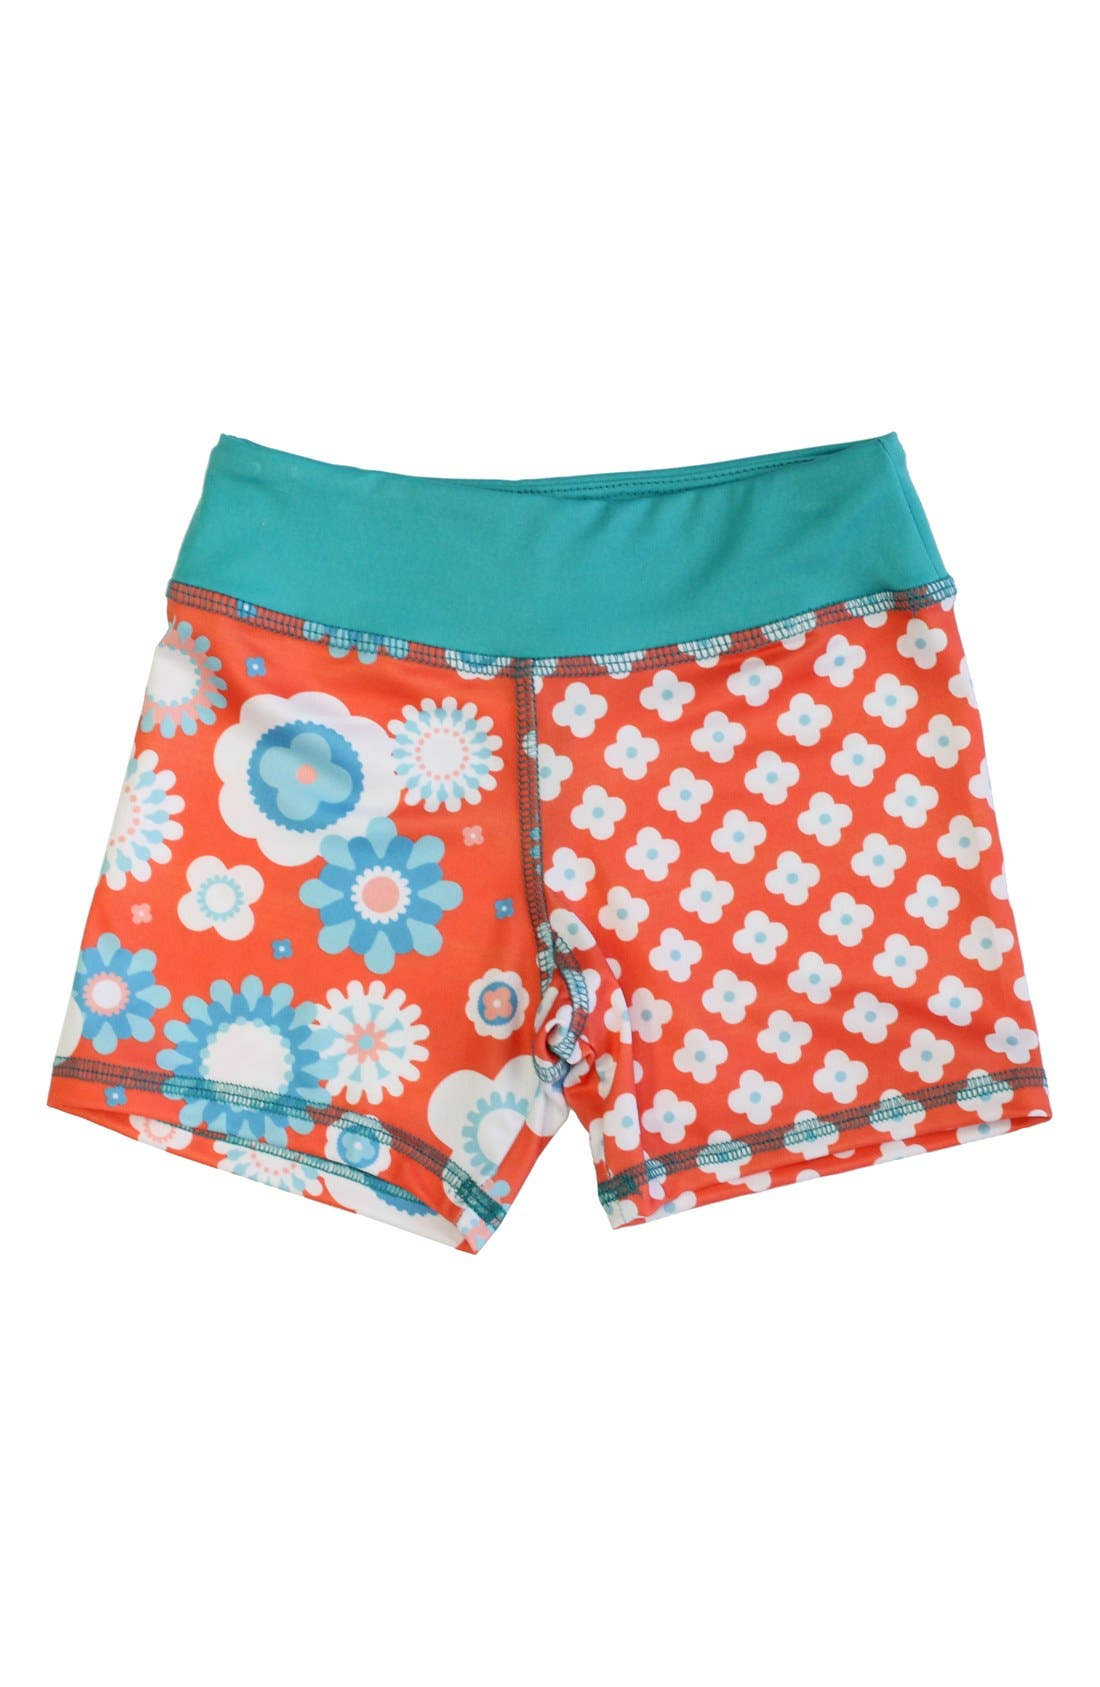 CHOOZE 'Splits' Mixed Print Shorts